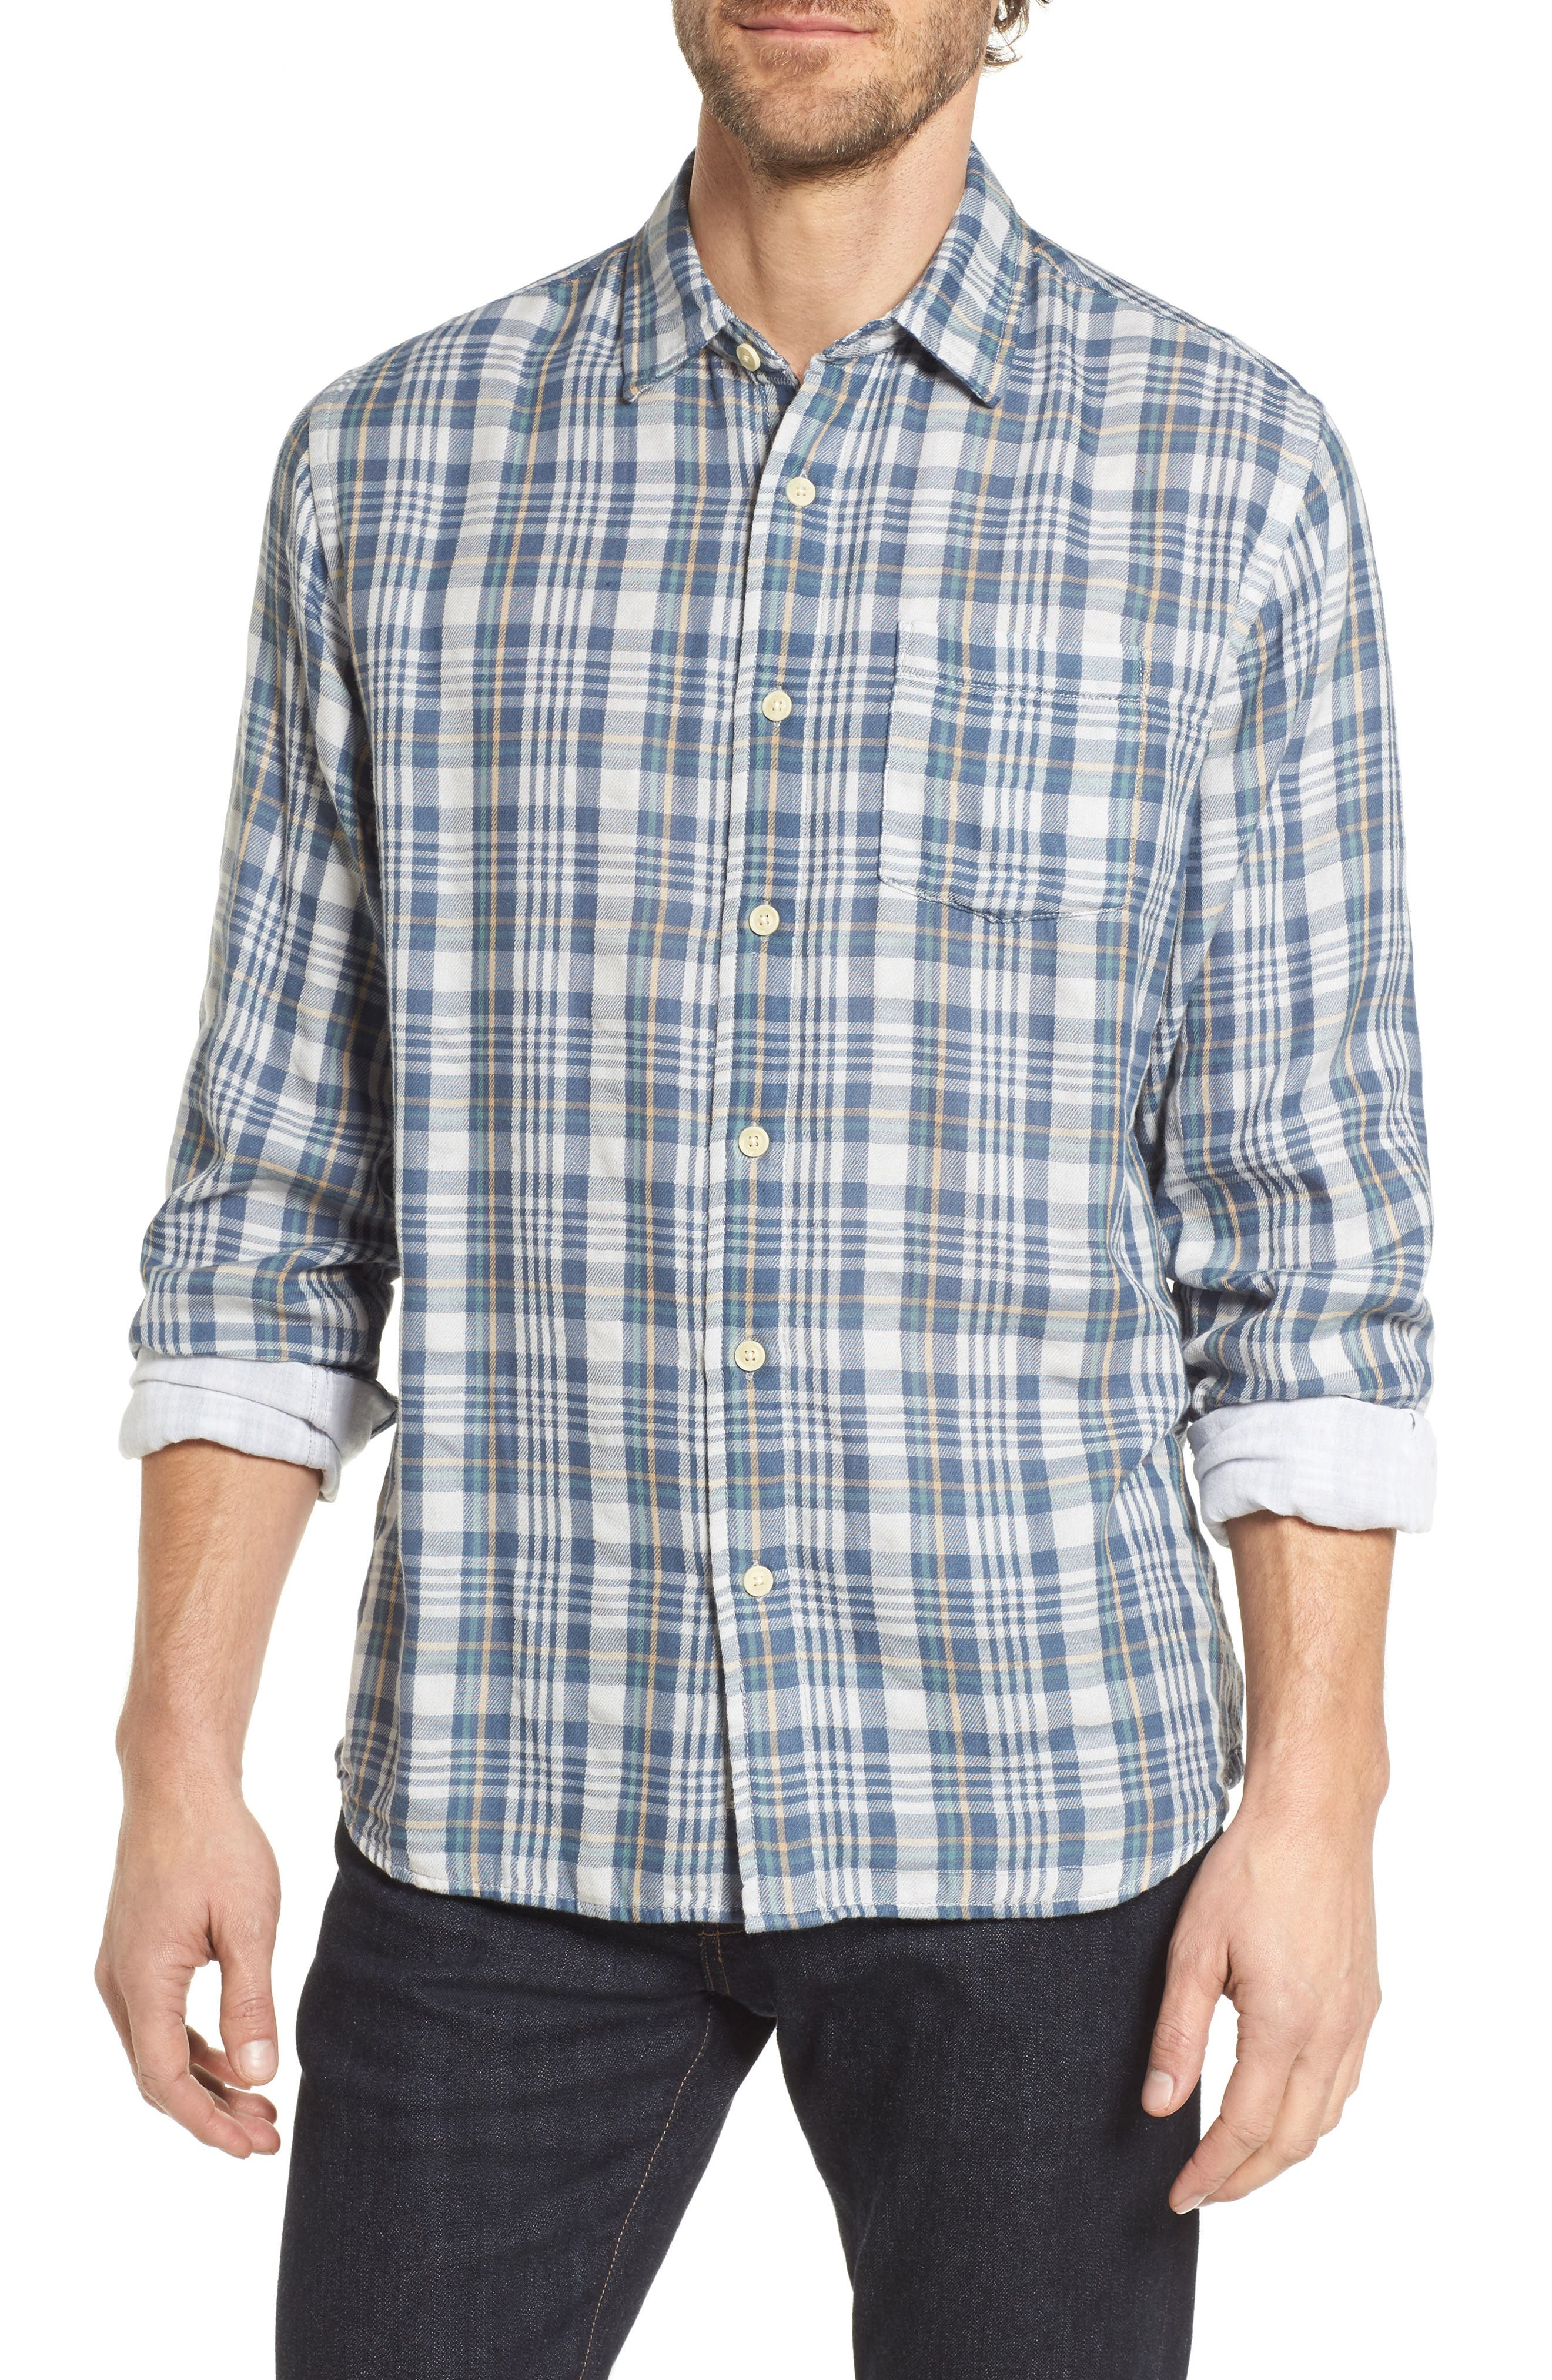 Grayers Abercorn Double Cloth Plaid Sport Shirt